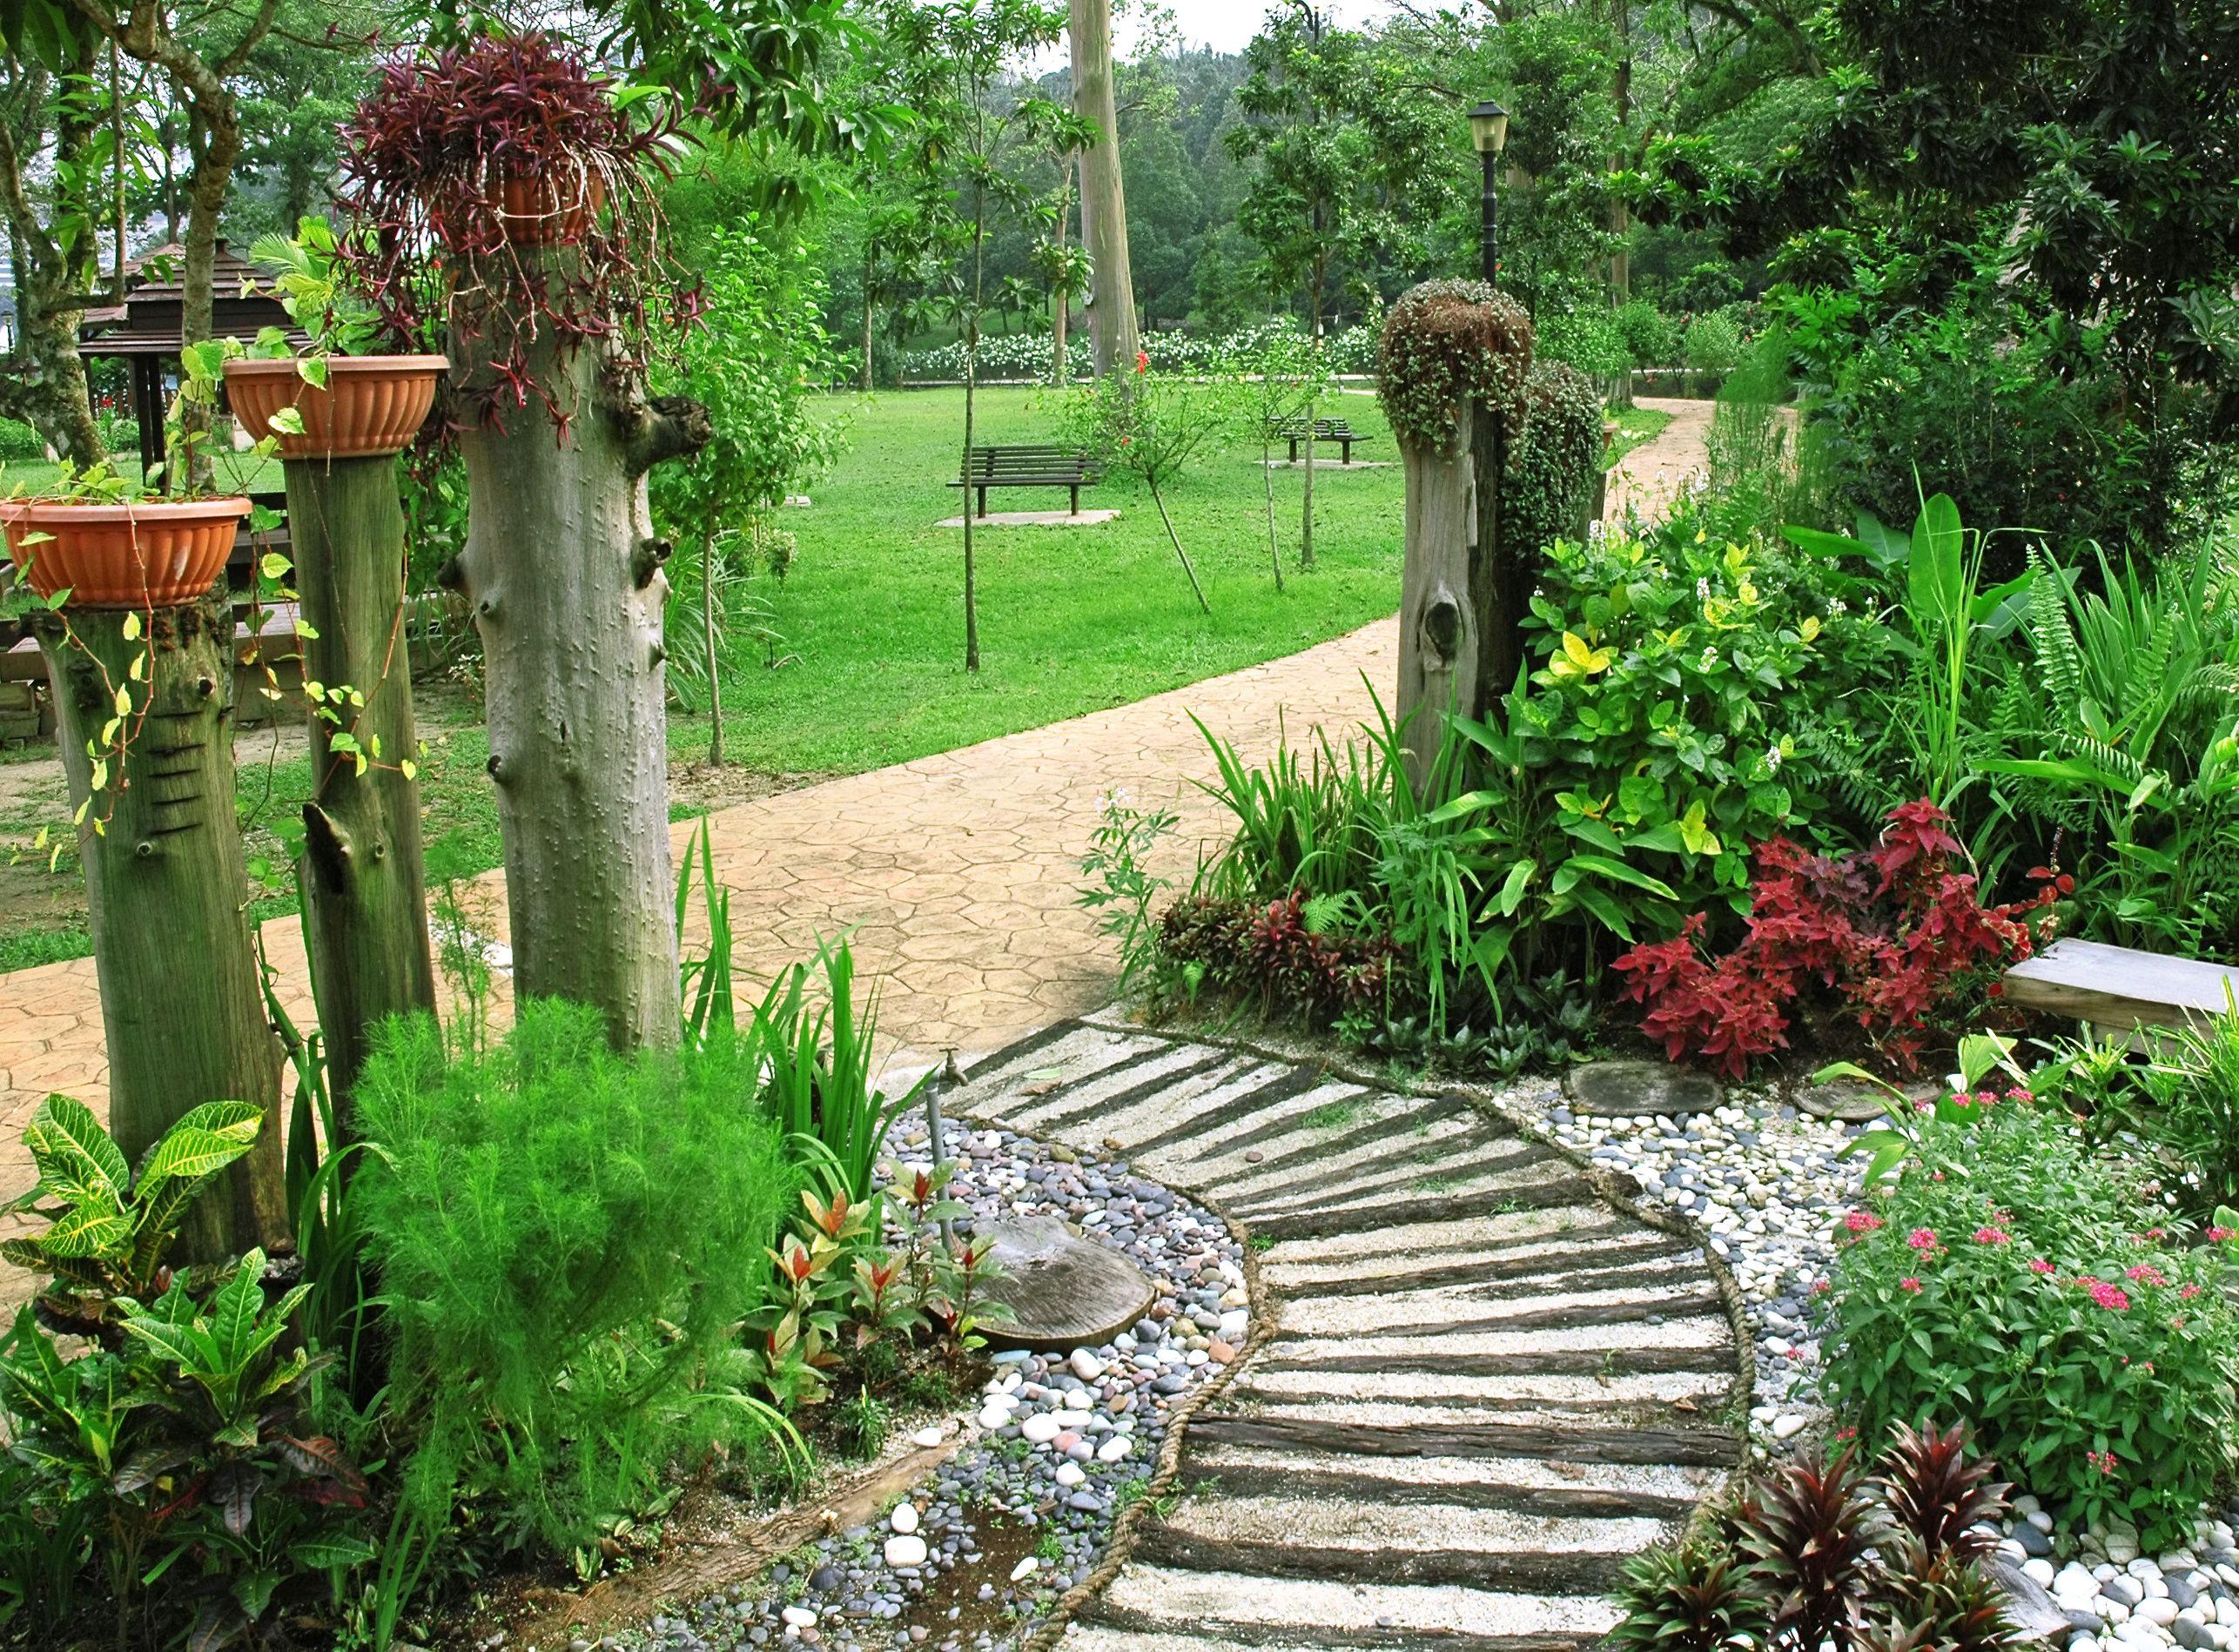 terrasse blumen gestalten – reimplica, Best garten ideen | garten ...